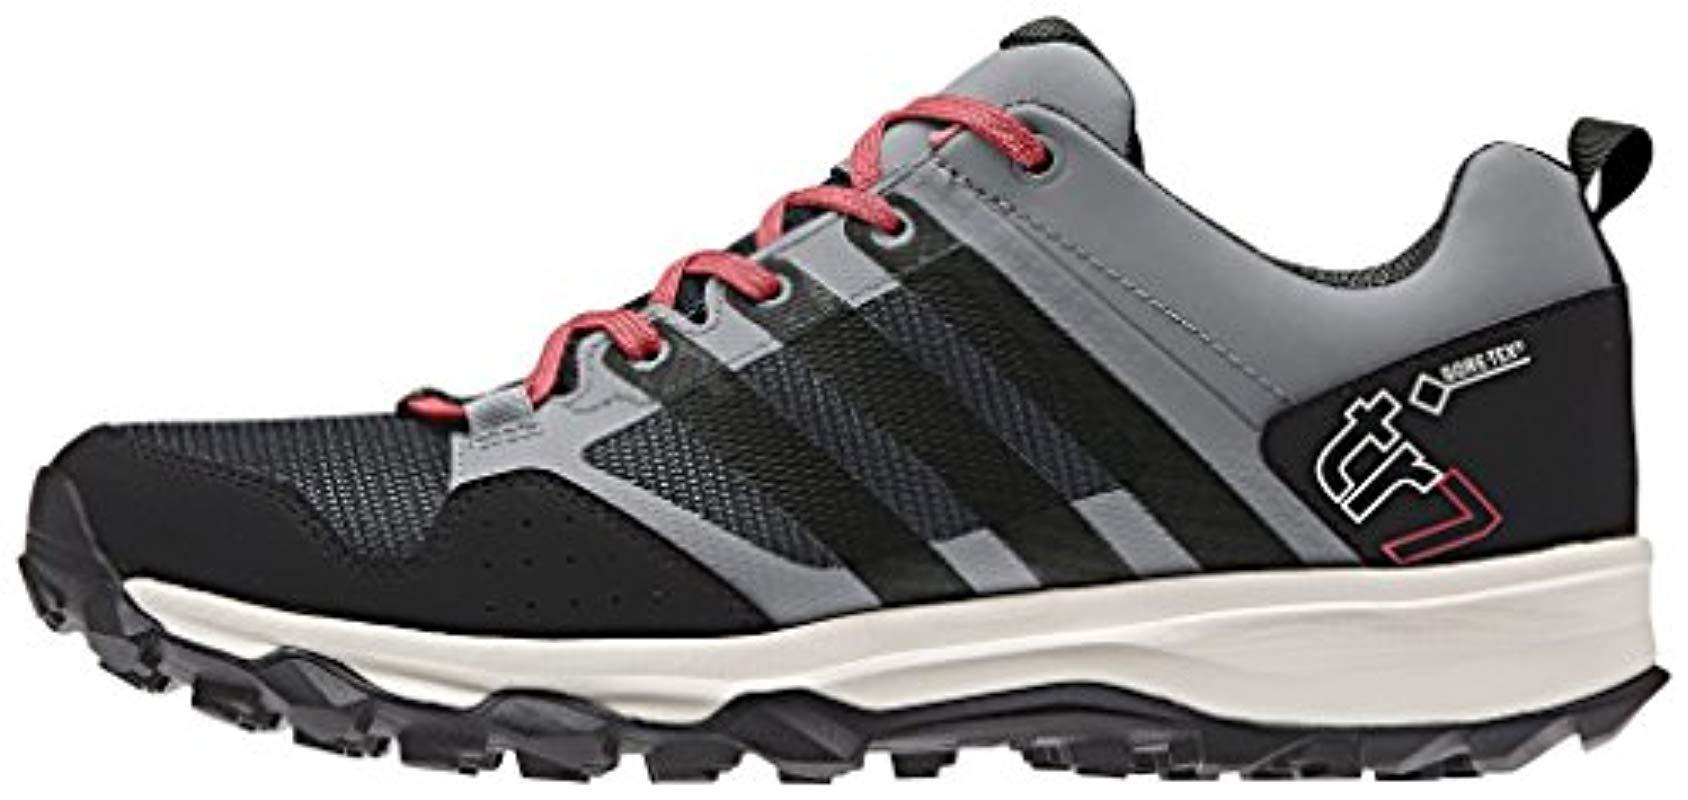 Lyst - adidas Originals Kanadia 7 Gore-tex Trail Running Shoe in ... 1794a2f137bcd